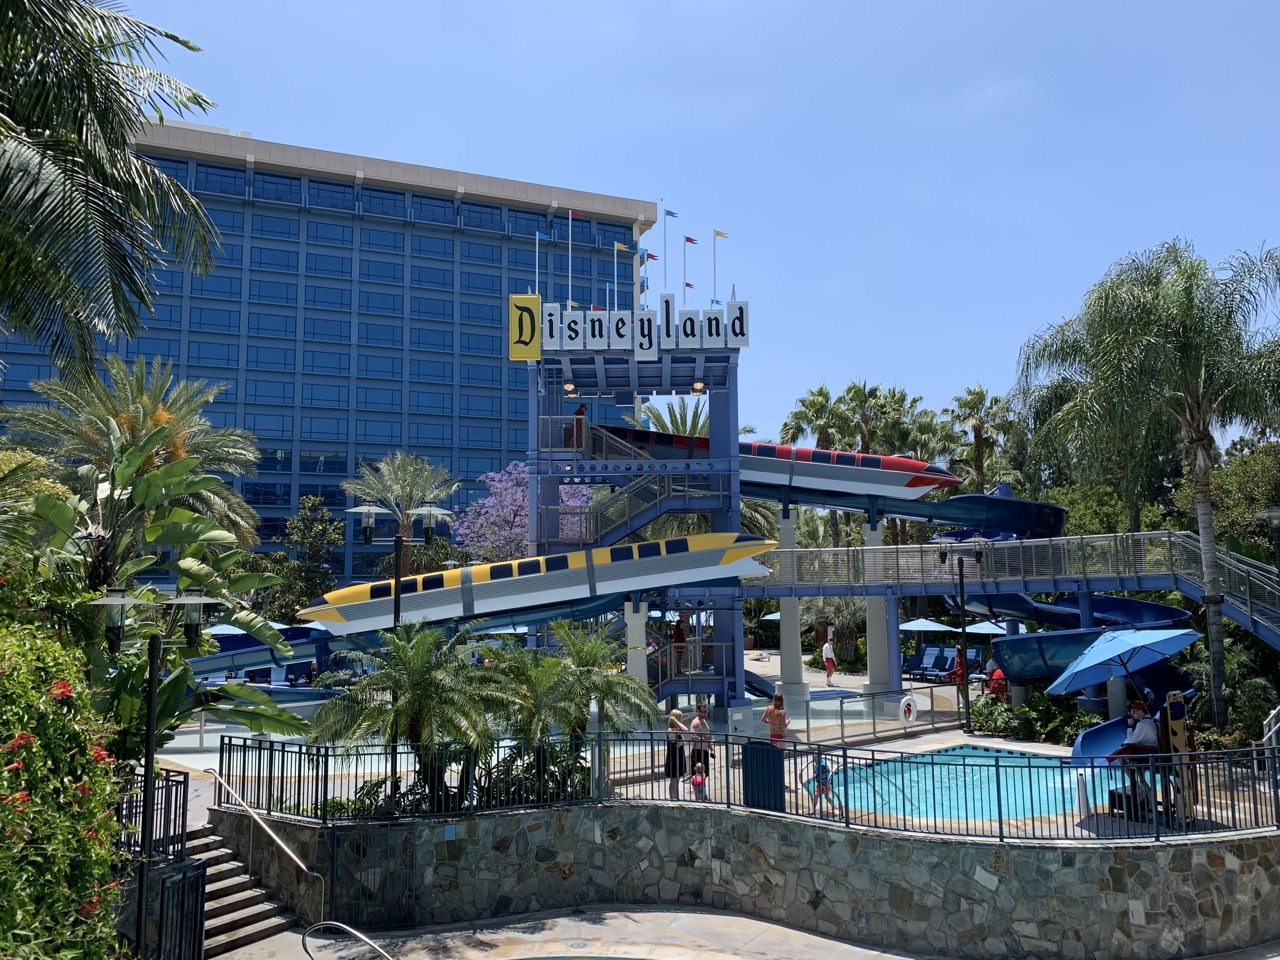 disneyland hotel pool 1.jpeg